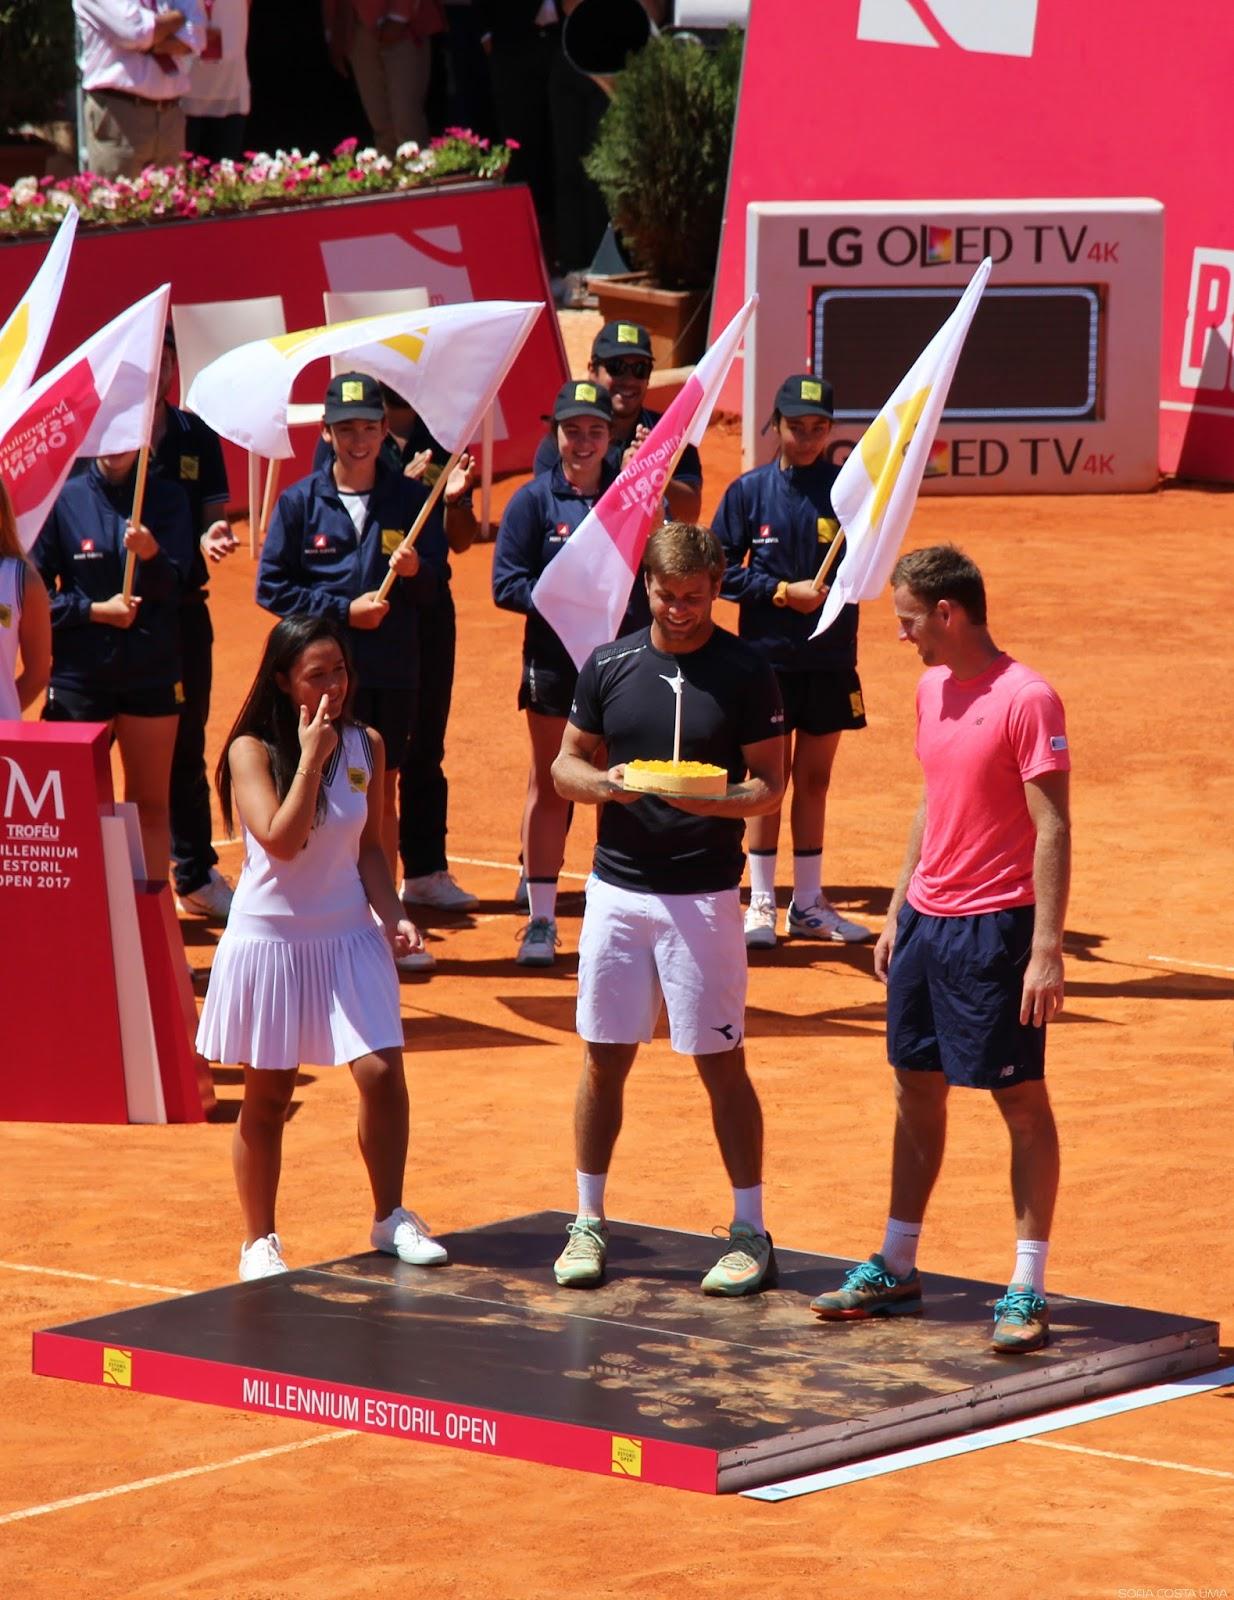 Ryan Harrison & Michael Venus - Millennium Estoril Open 2017